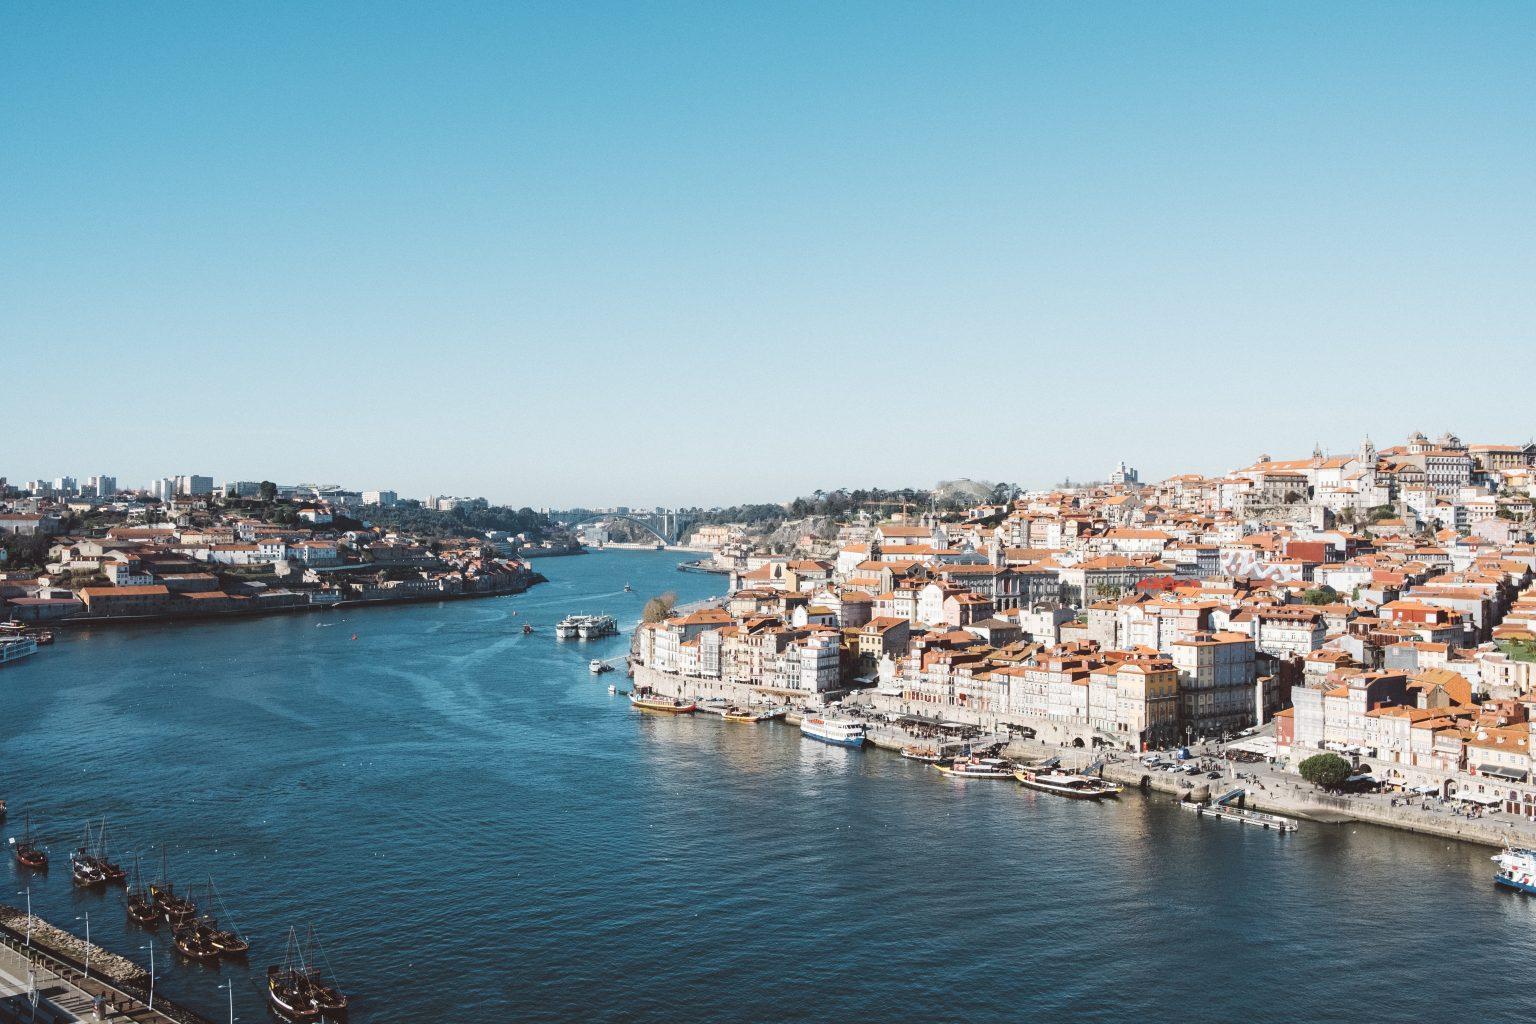 douro-porto-1536x1024.jpg